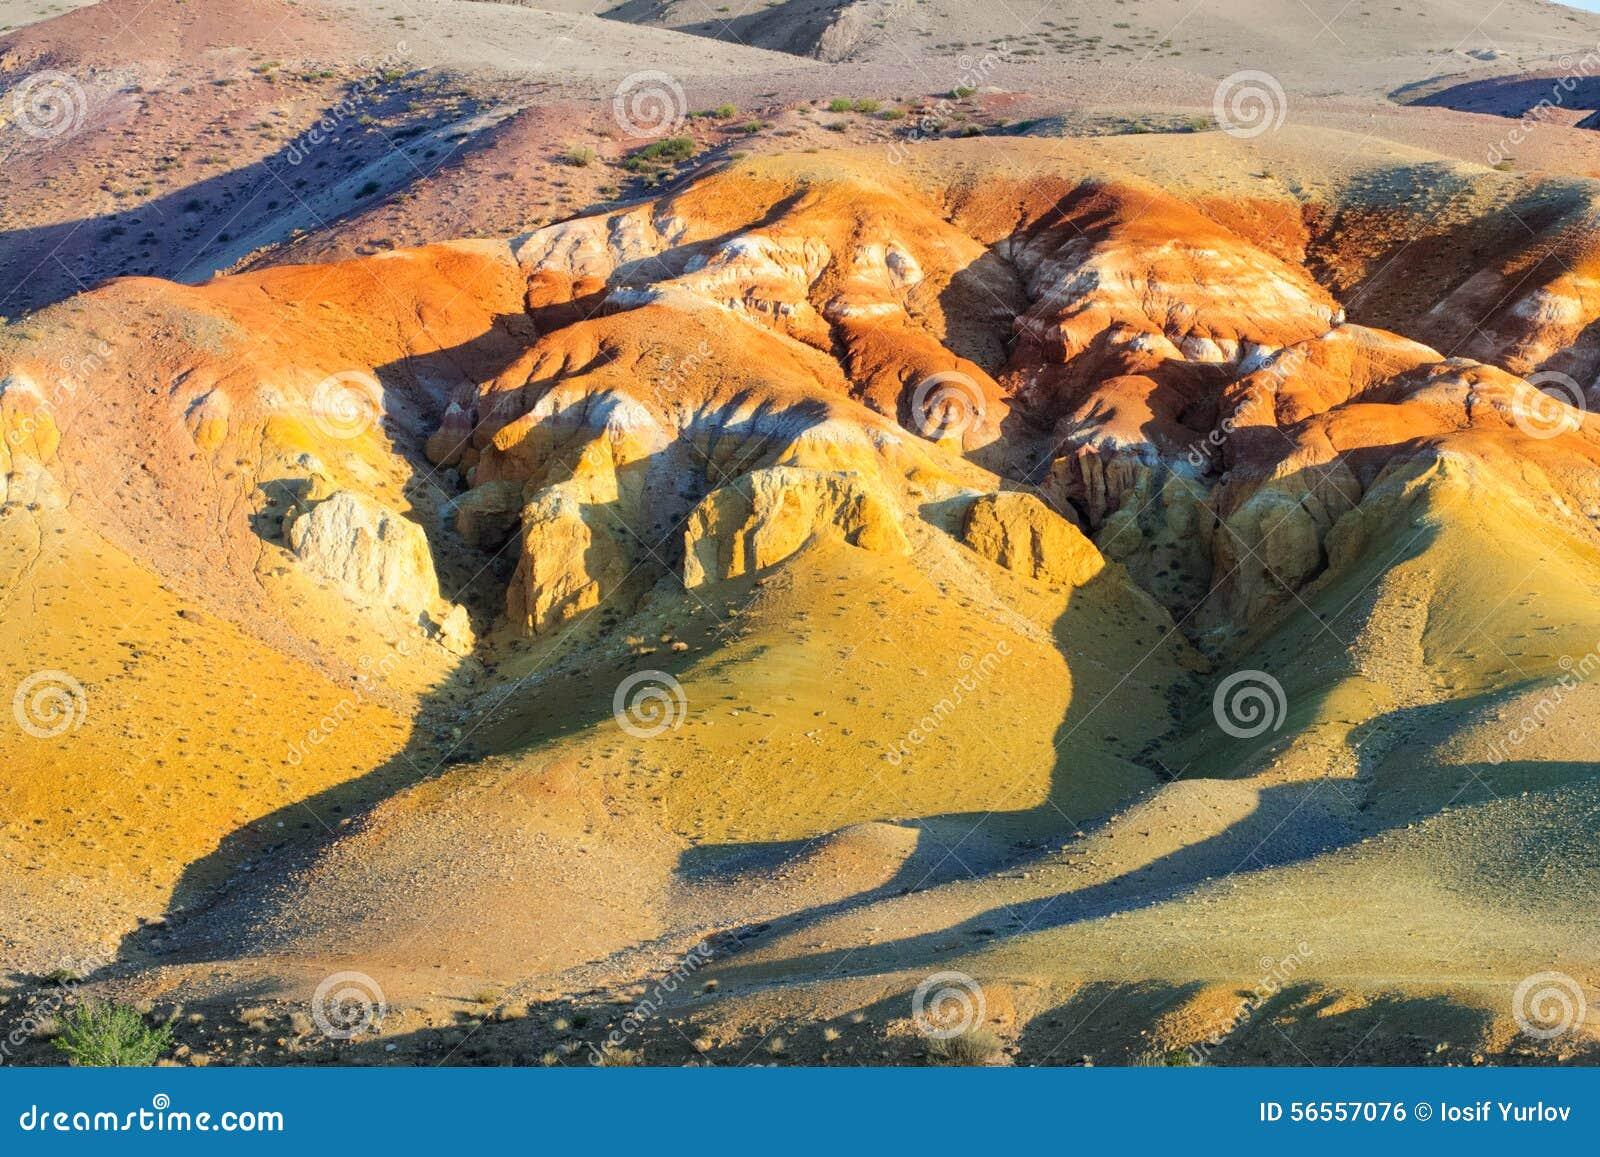 Download Χώμα χρώματος των καταθέσεων υδραργύρου σε Altai Στοκ Εικόνες - εικόνα από χώρα, φύση: 56557076